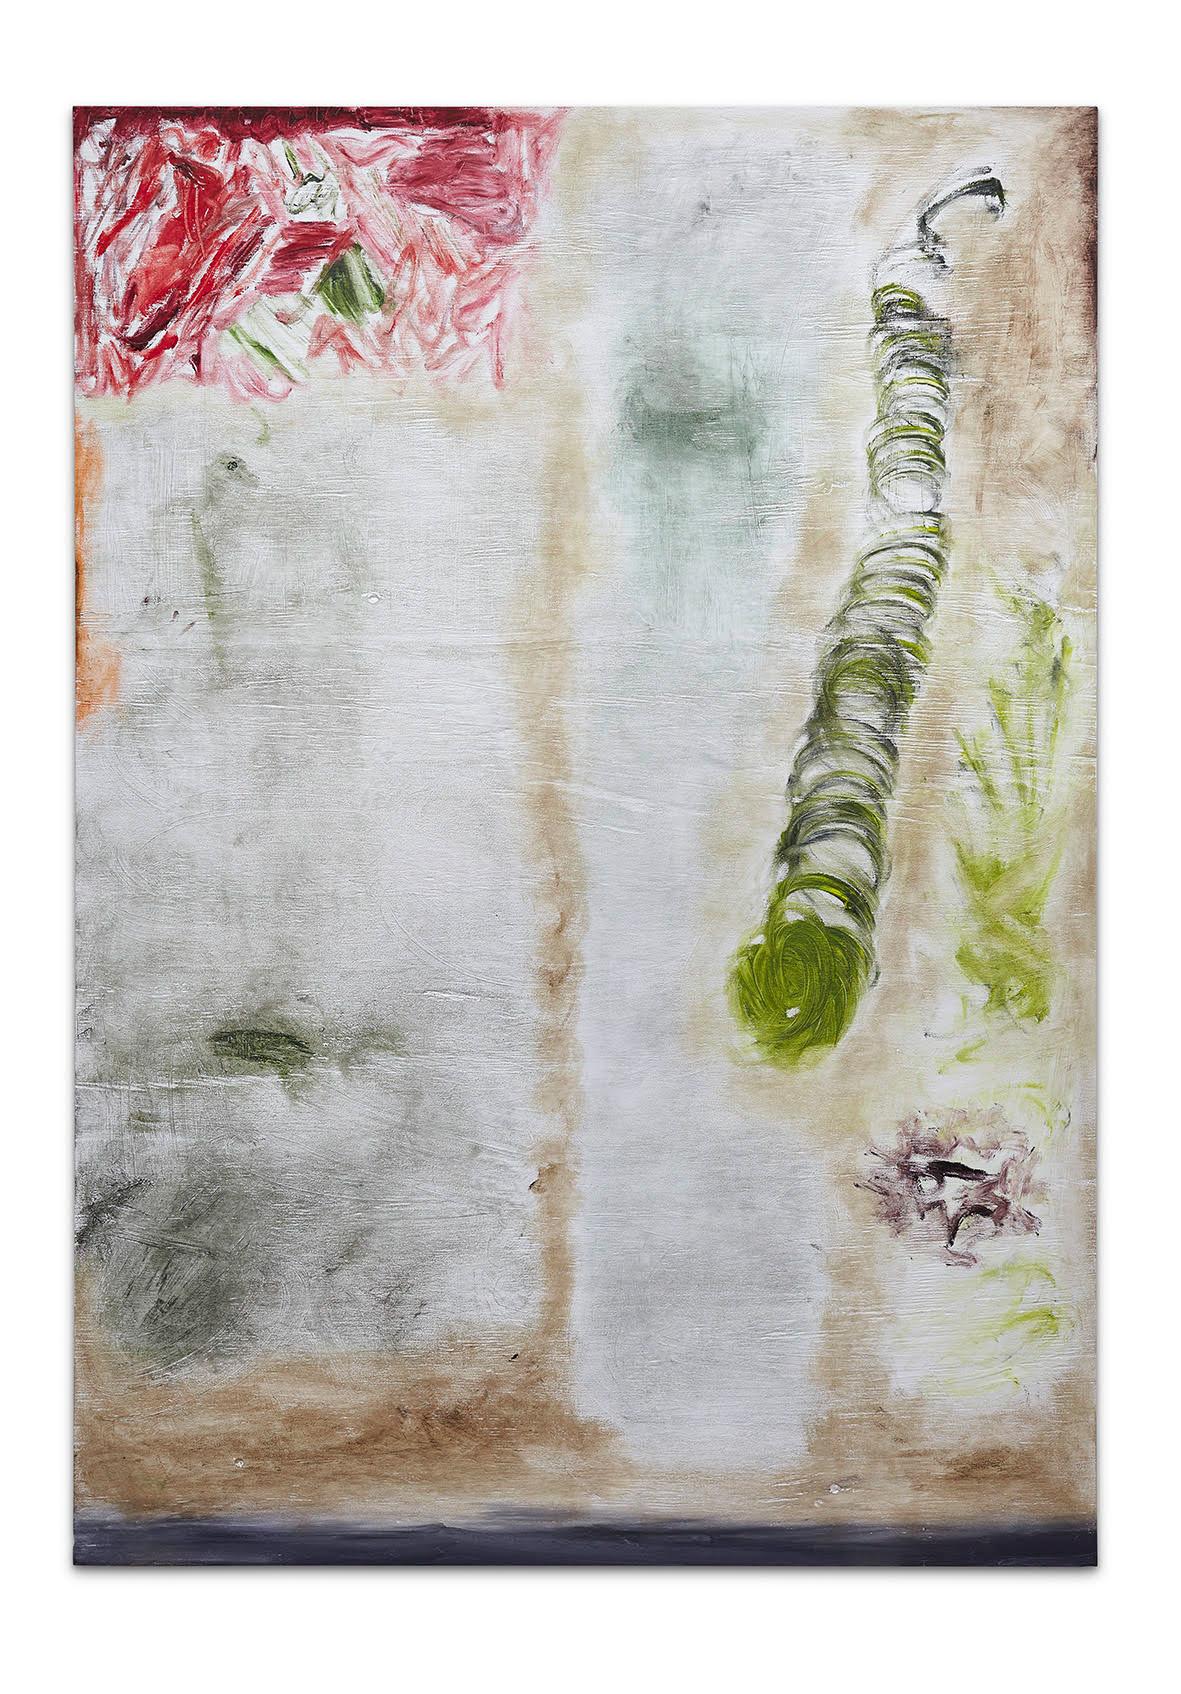 Joaquín Boz <em>Untitled</em>, 2017. Oil on panel, 53 x 37 1/2 inches (134.6 x 95.3 cm)